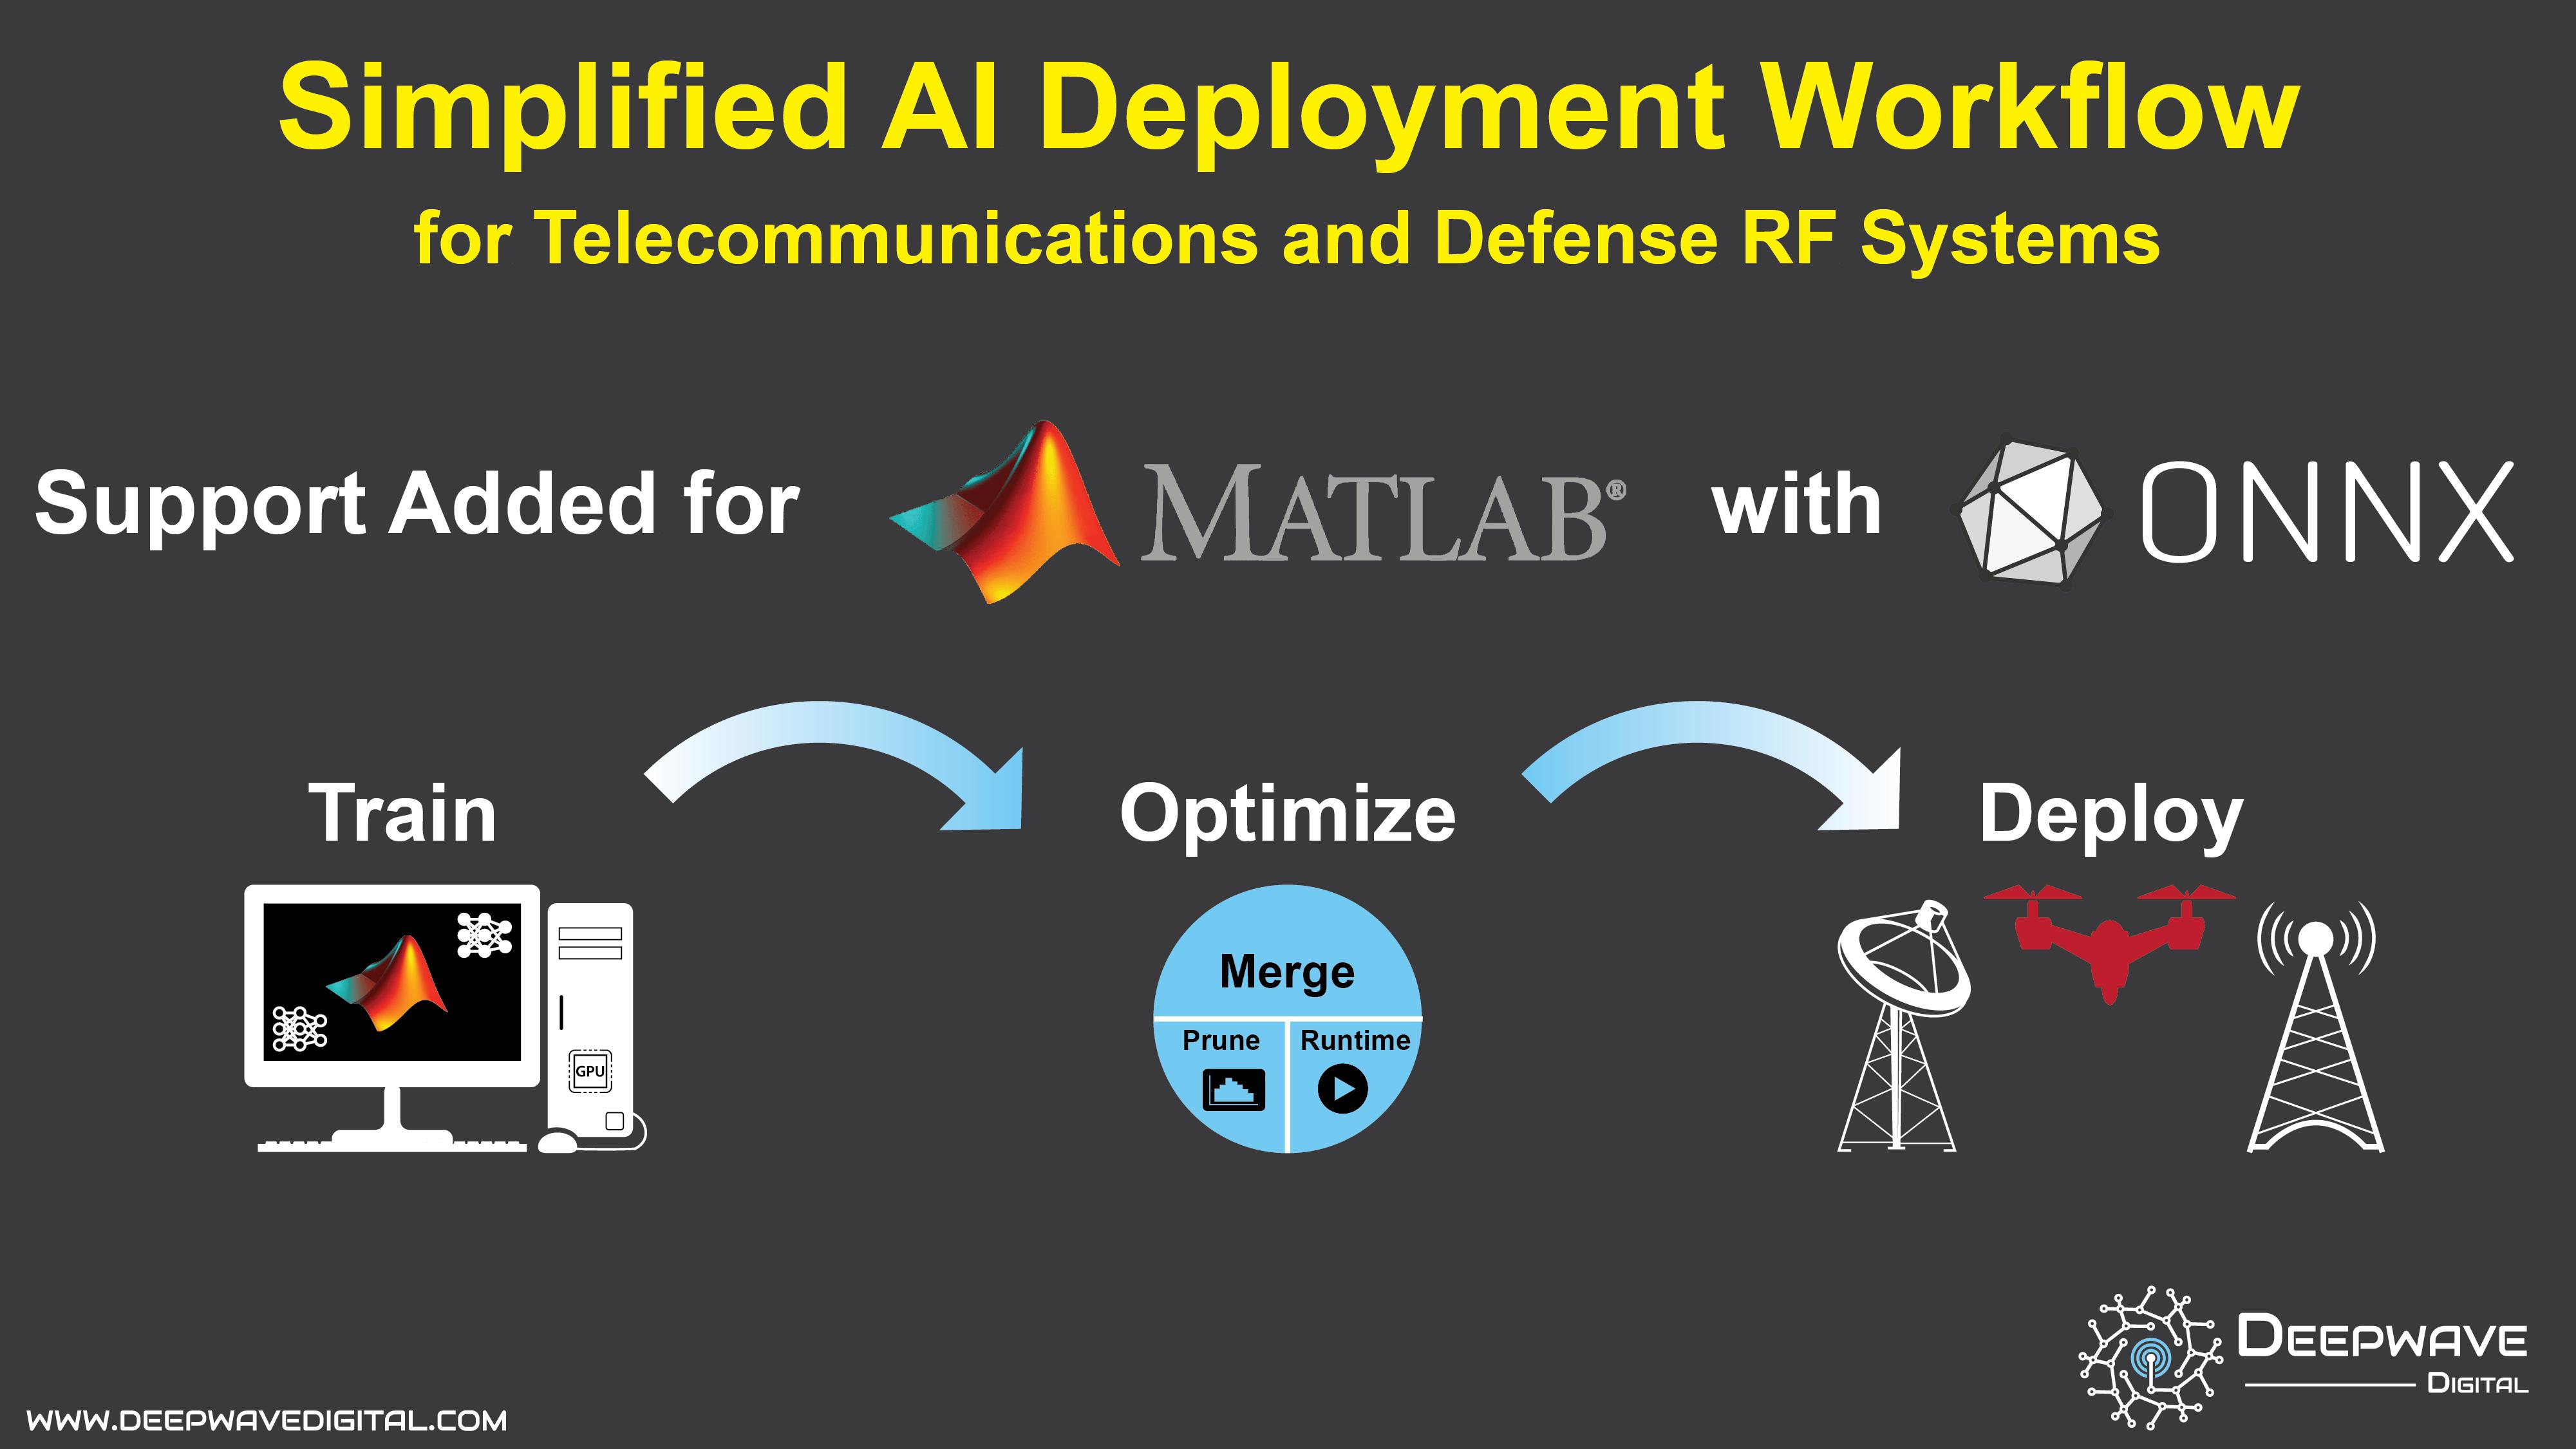 MATLAB and Deepwave's GPU SDR